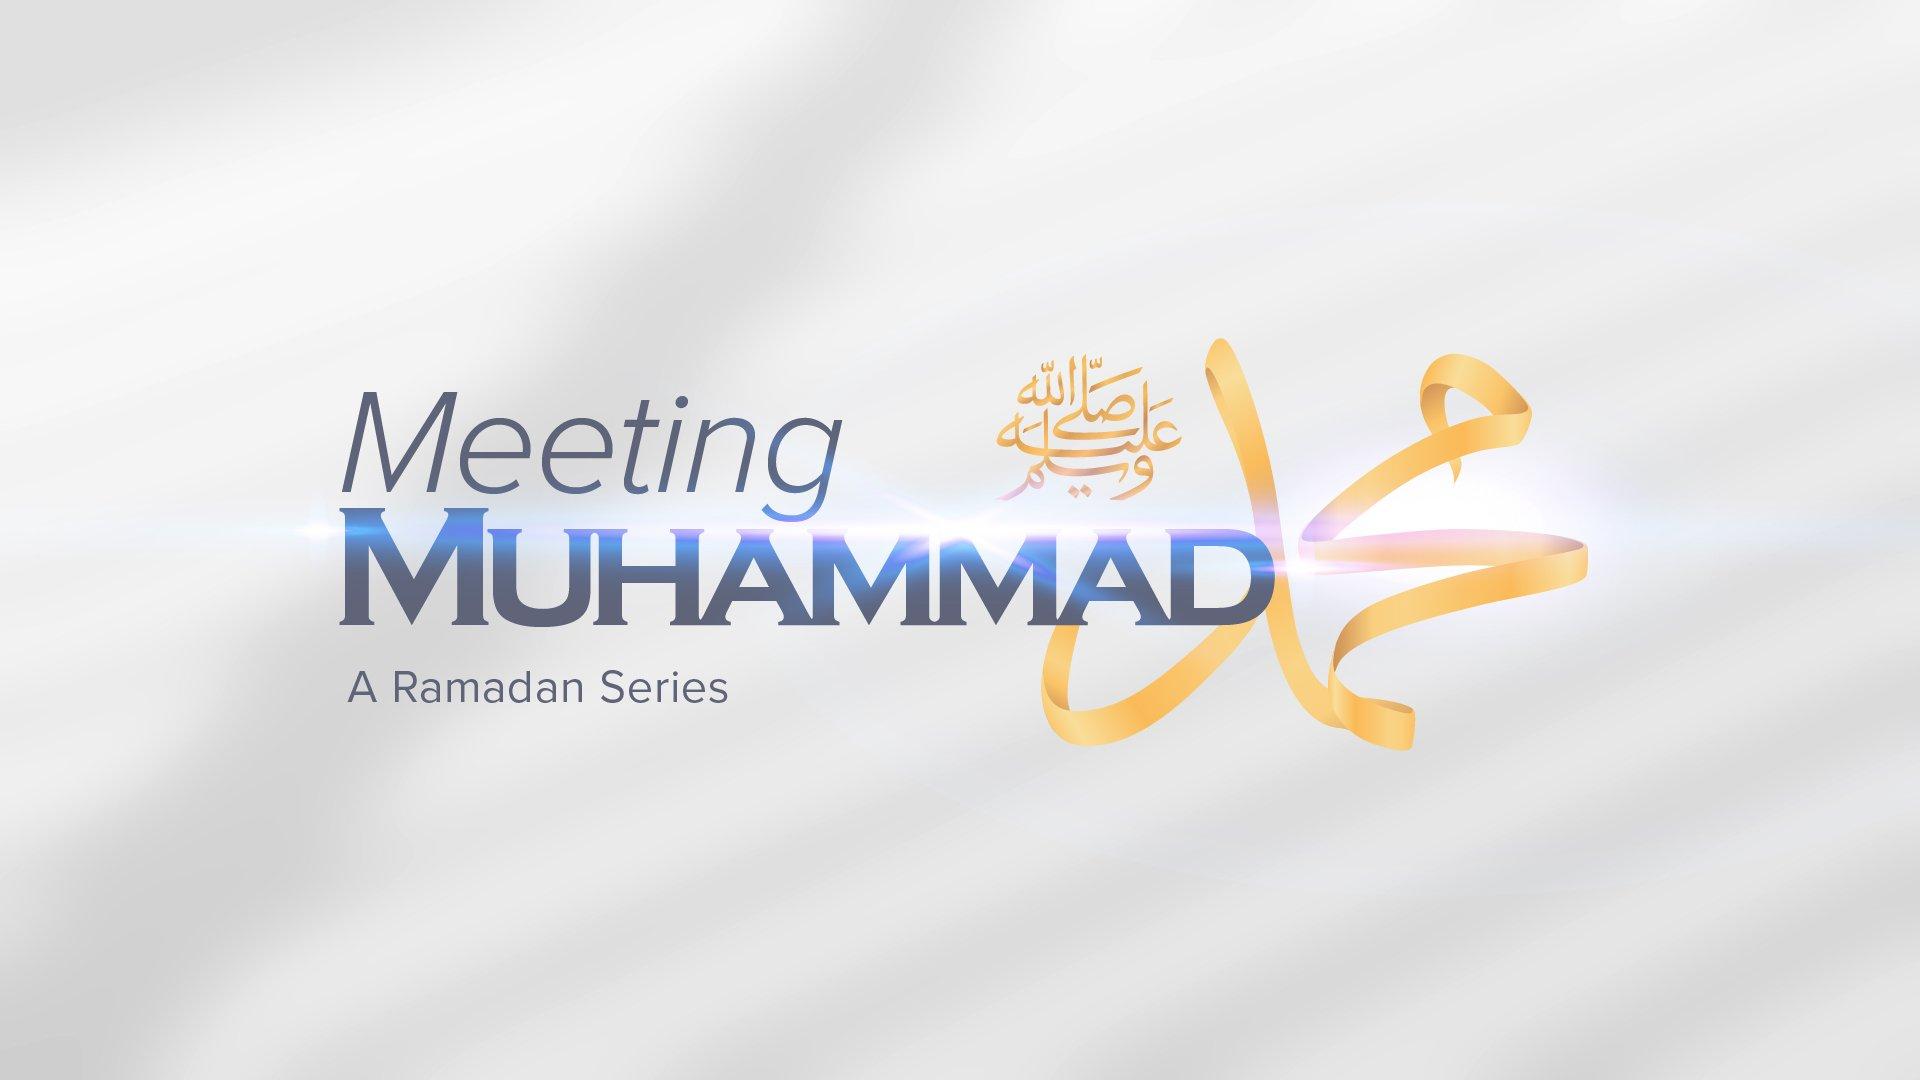 Meeting Muhammad ﷺ